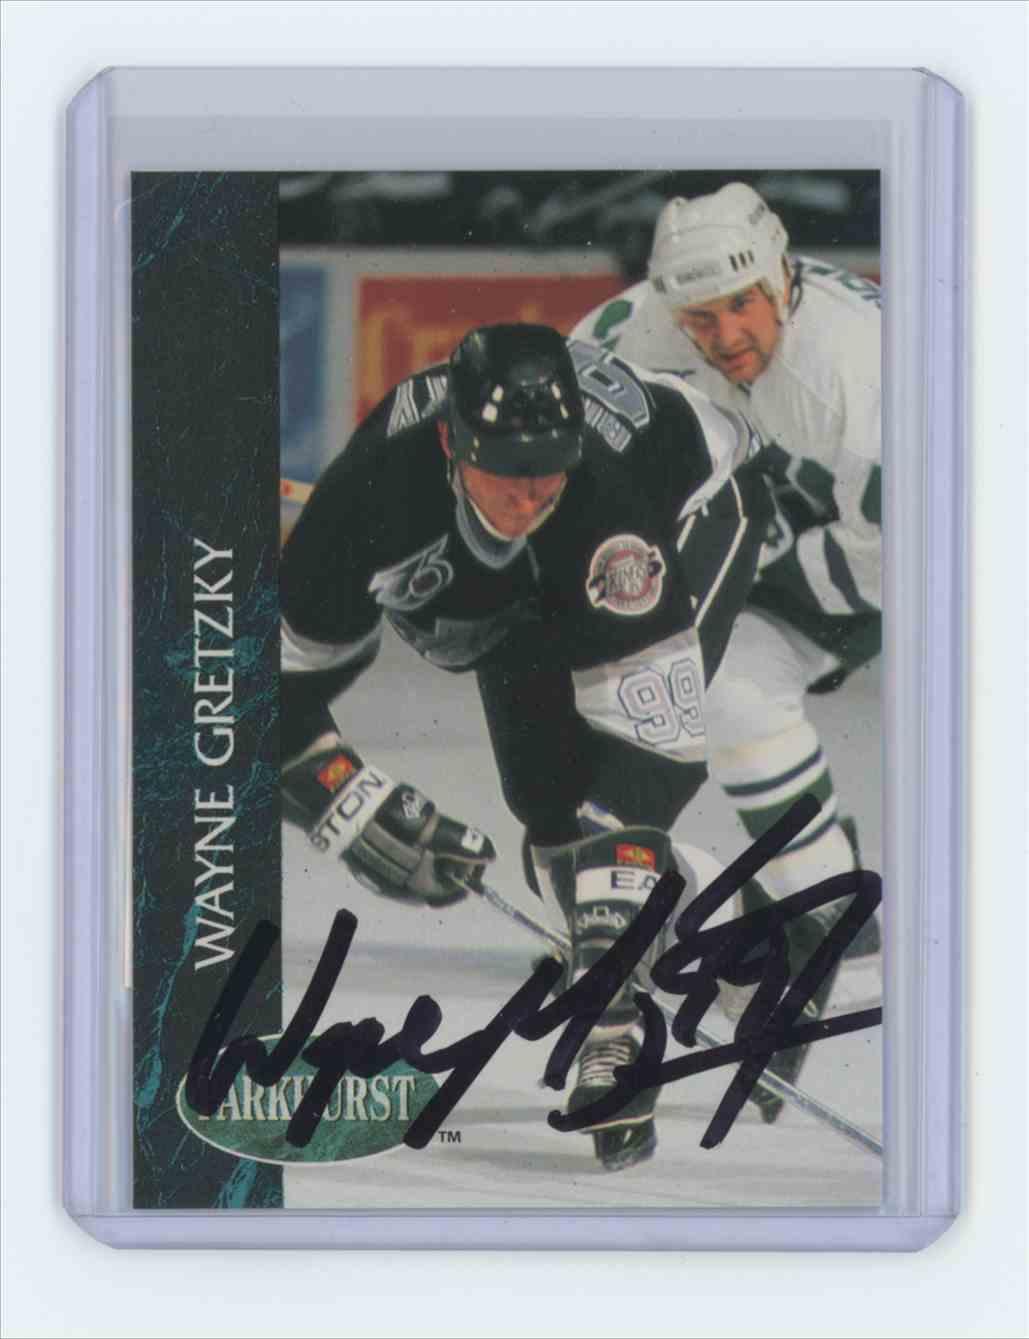 1992 1992-93 Parkhurst #65 Wayne Gretzky Los Angeles Kings Auto Wayne Gretzky #65 card front image